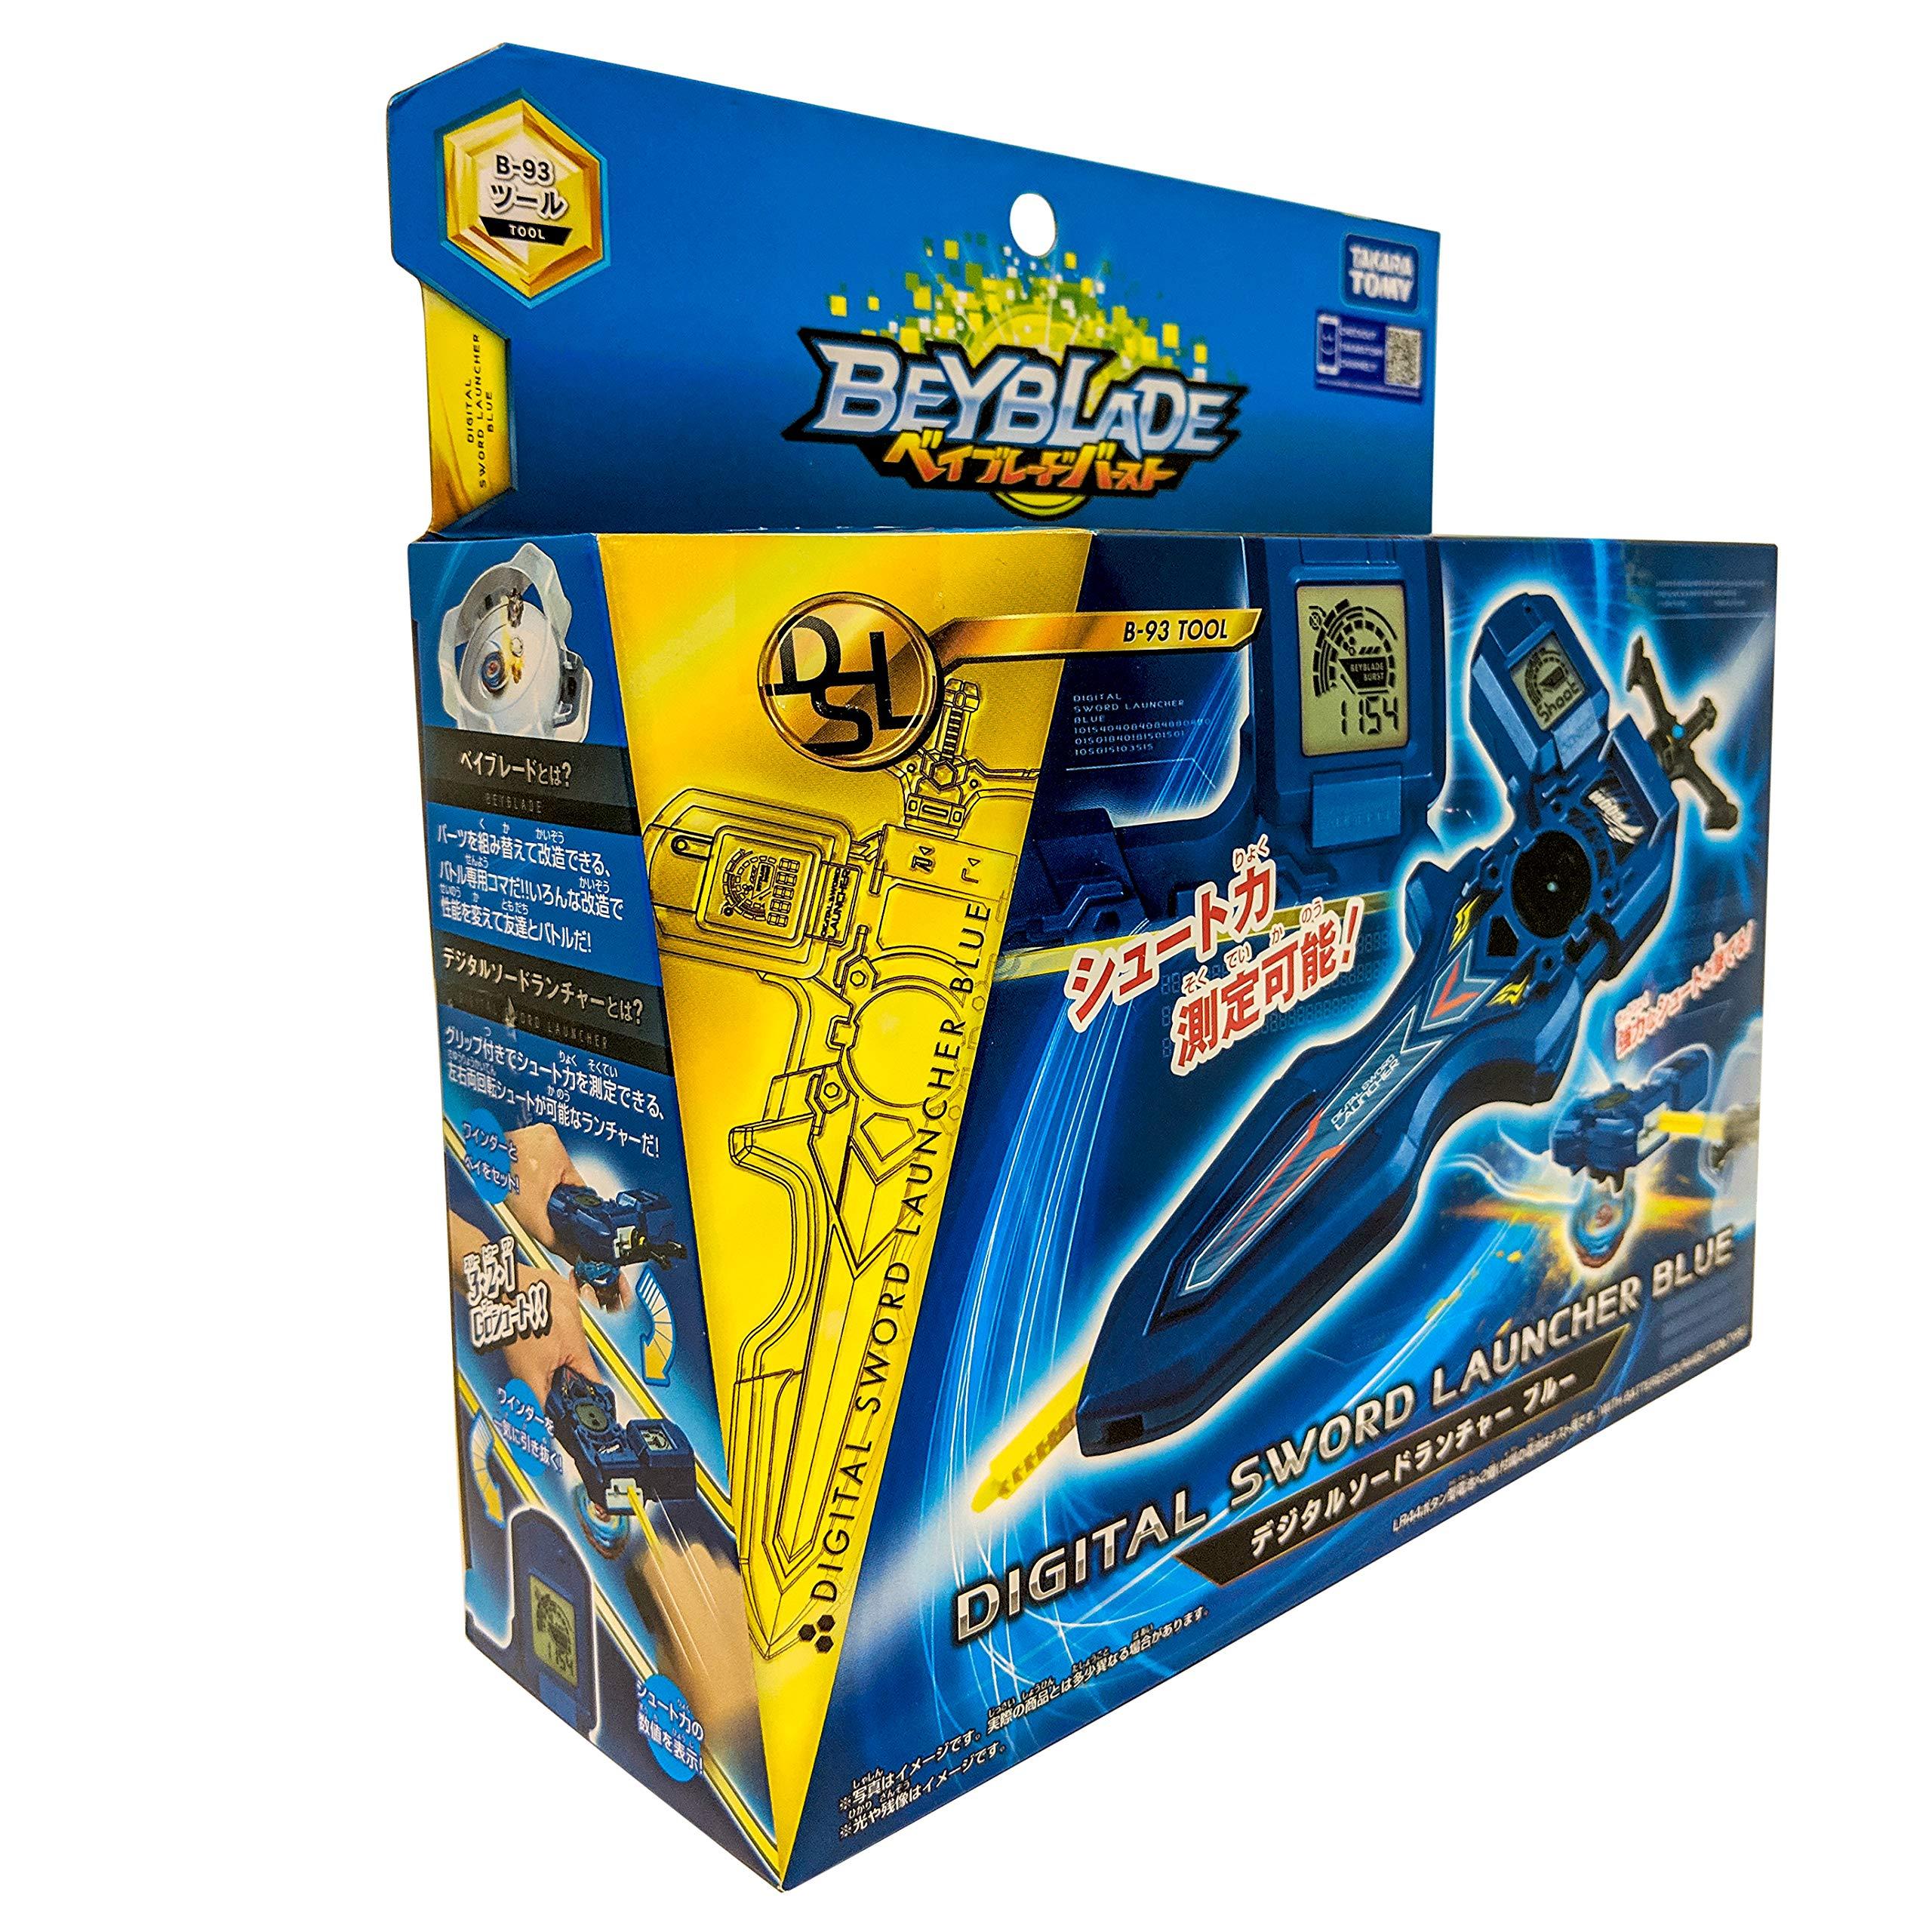 Takara Tomy B-93 Beyblade Burst Digital Sword Launcher Blue by Takaratomy (Image #5)